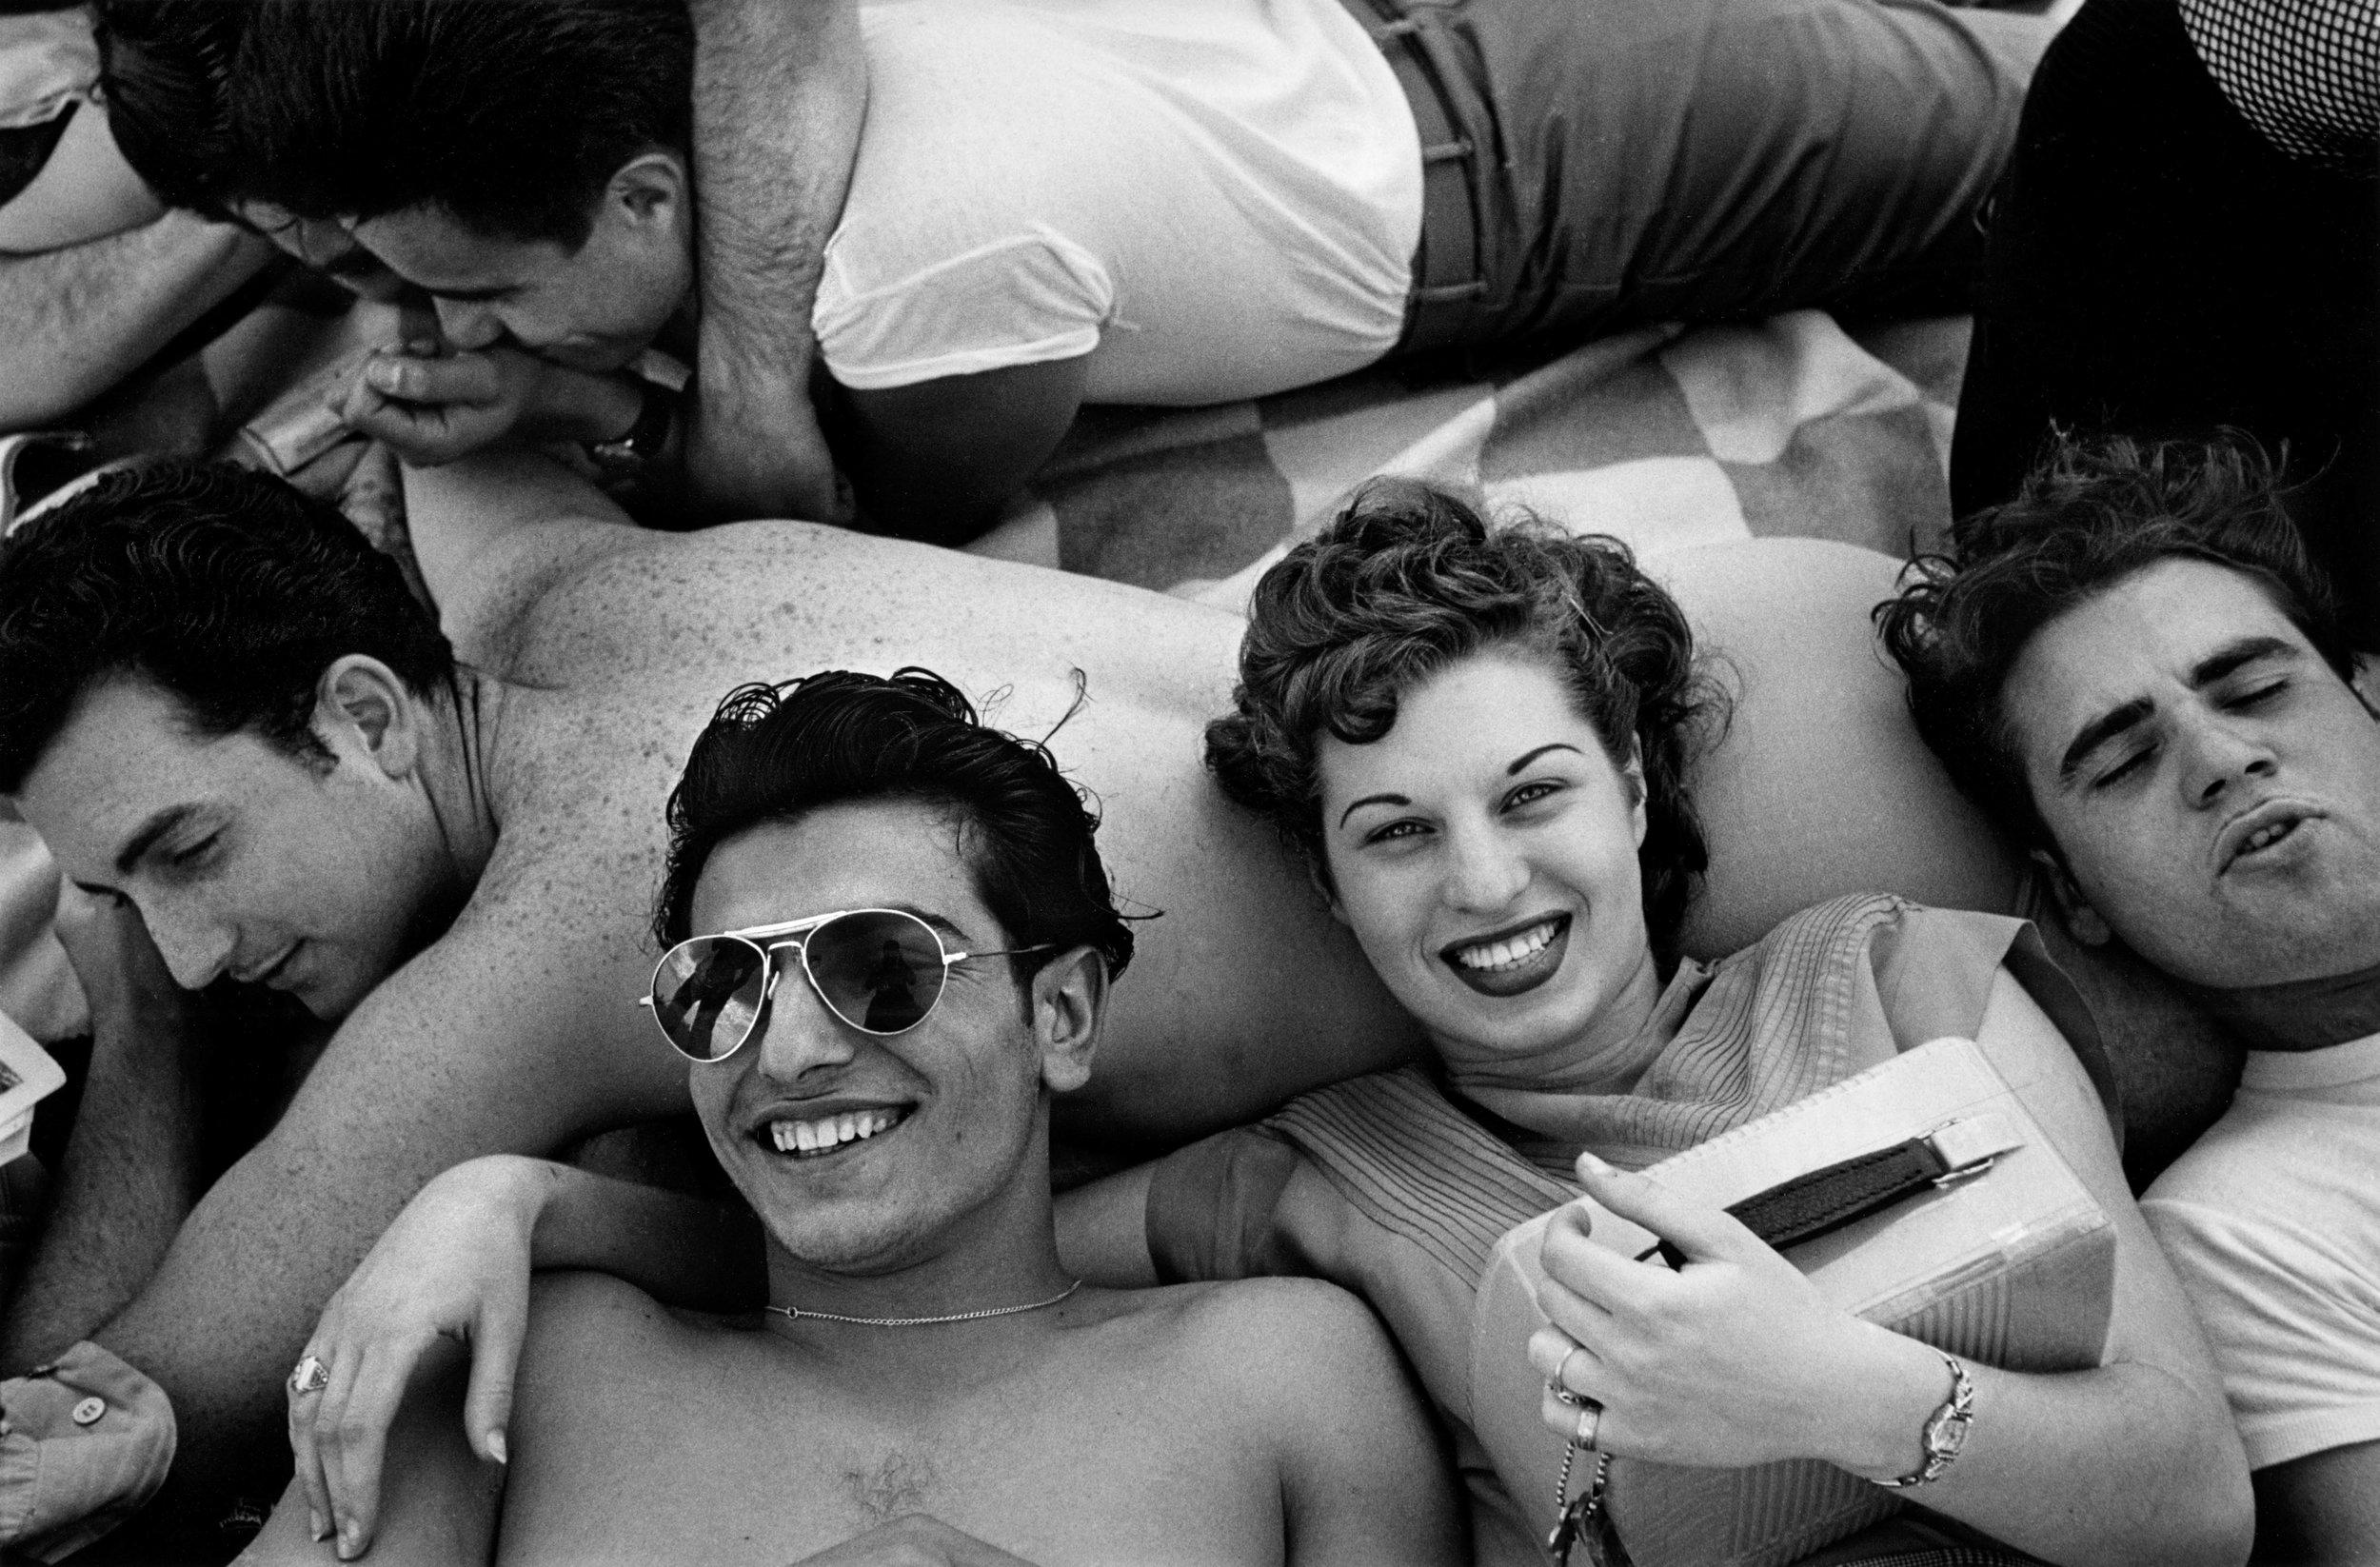 CI-023_Coney_Island_Teenagers_1949.jpg